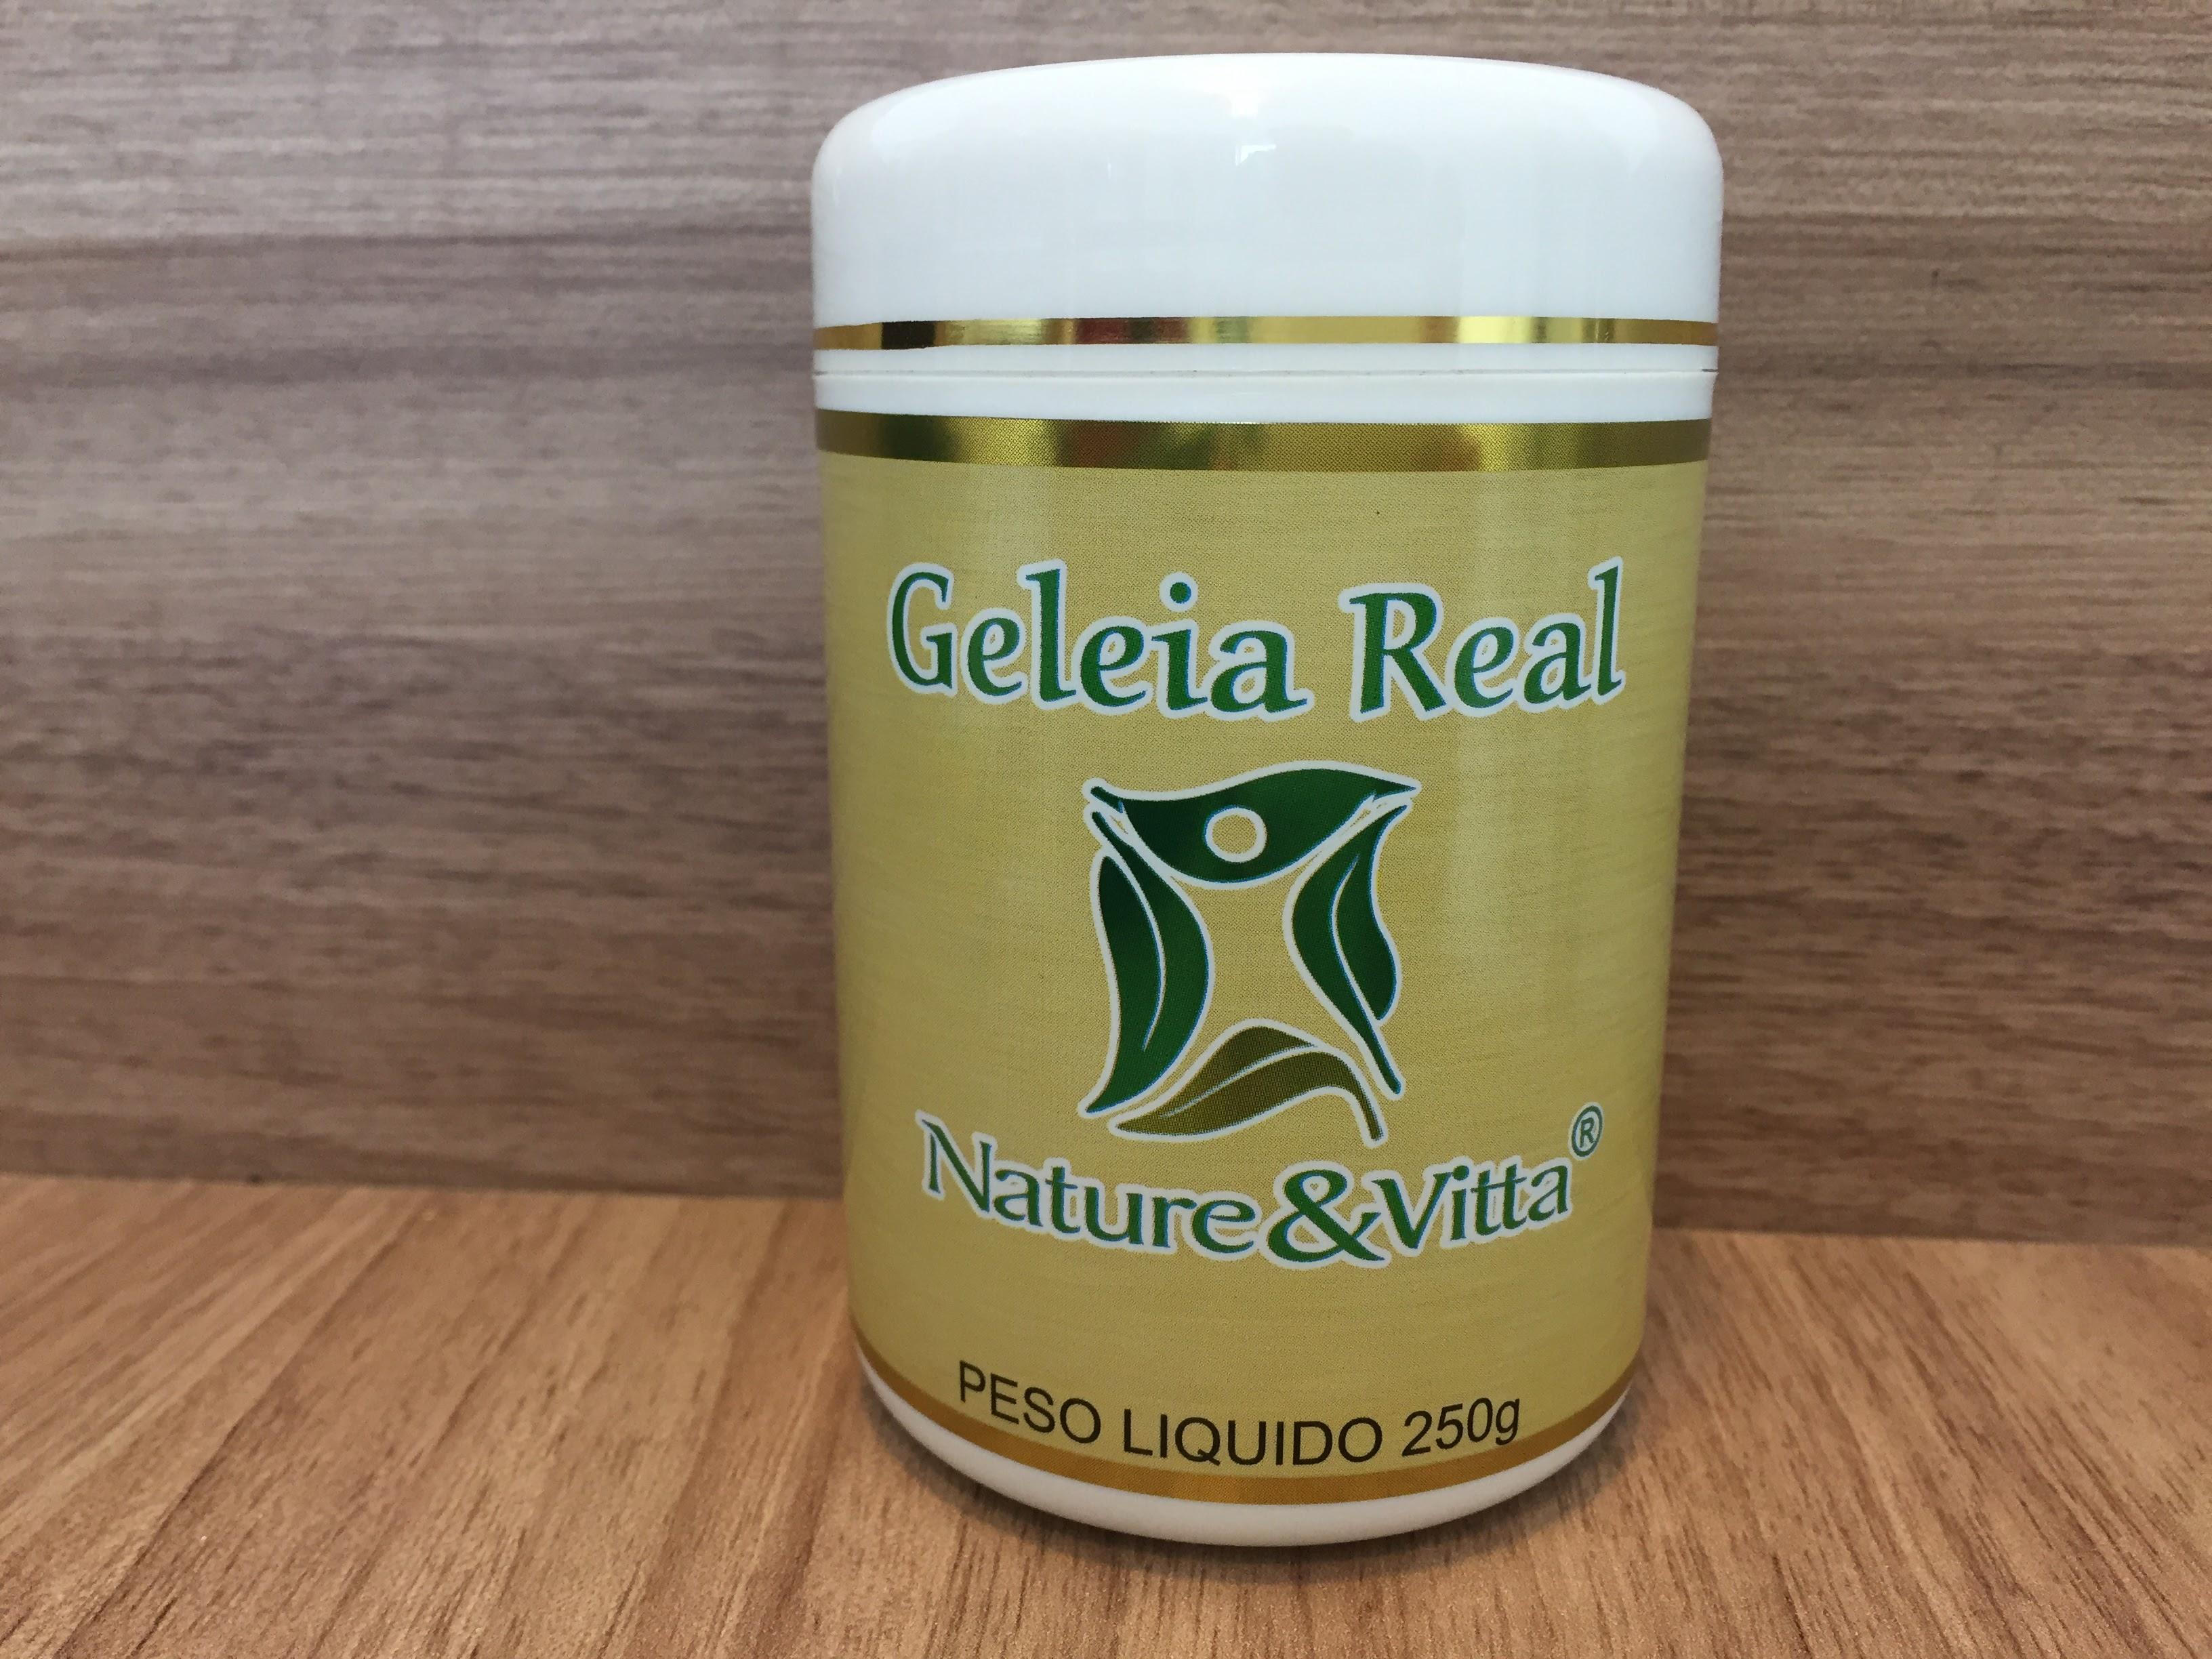 Geleia Real Nature&Vitta